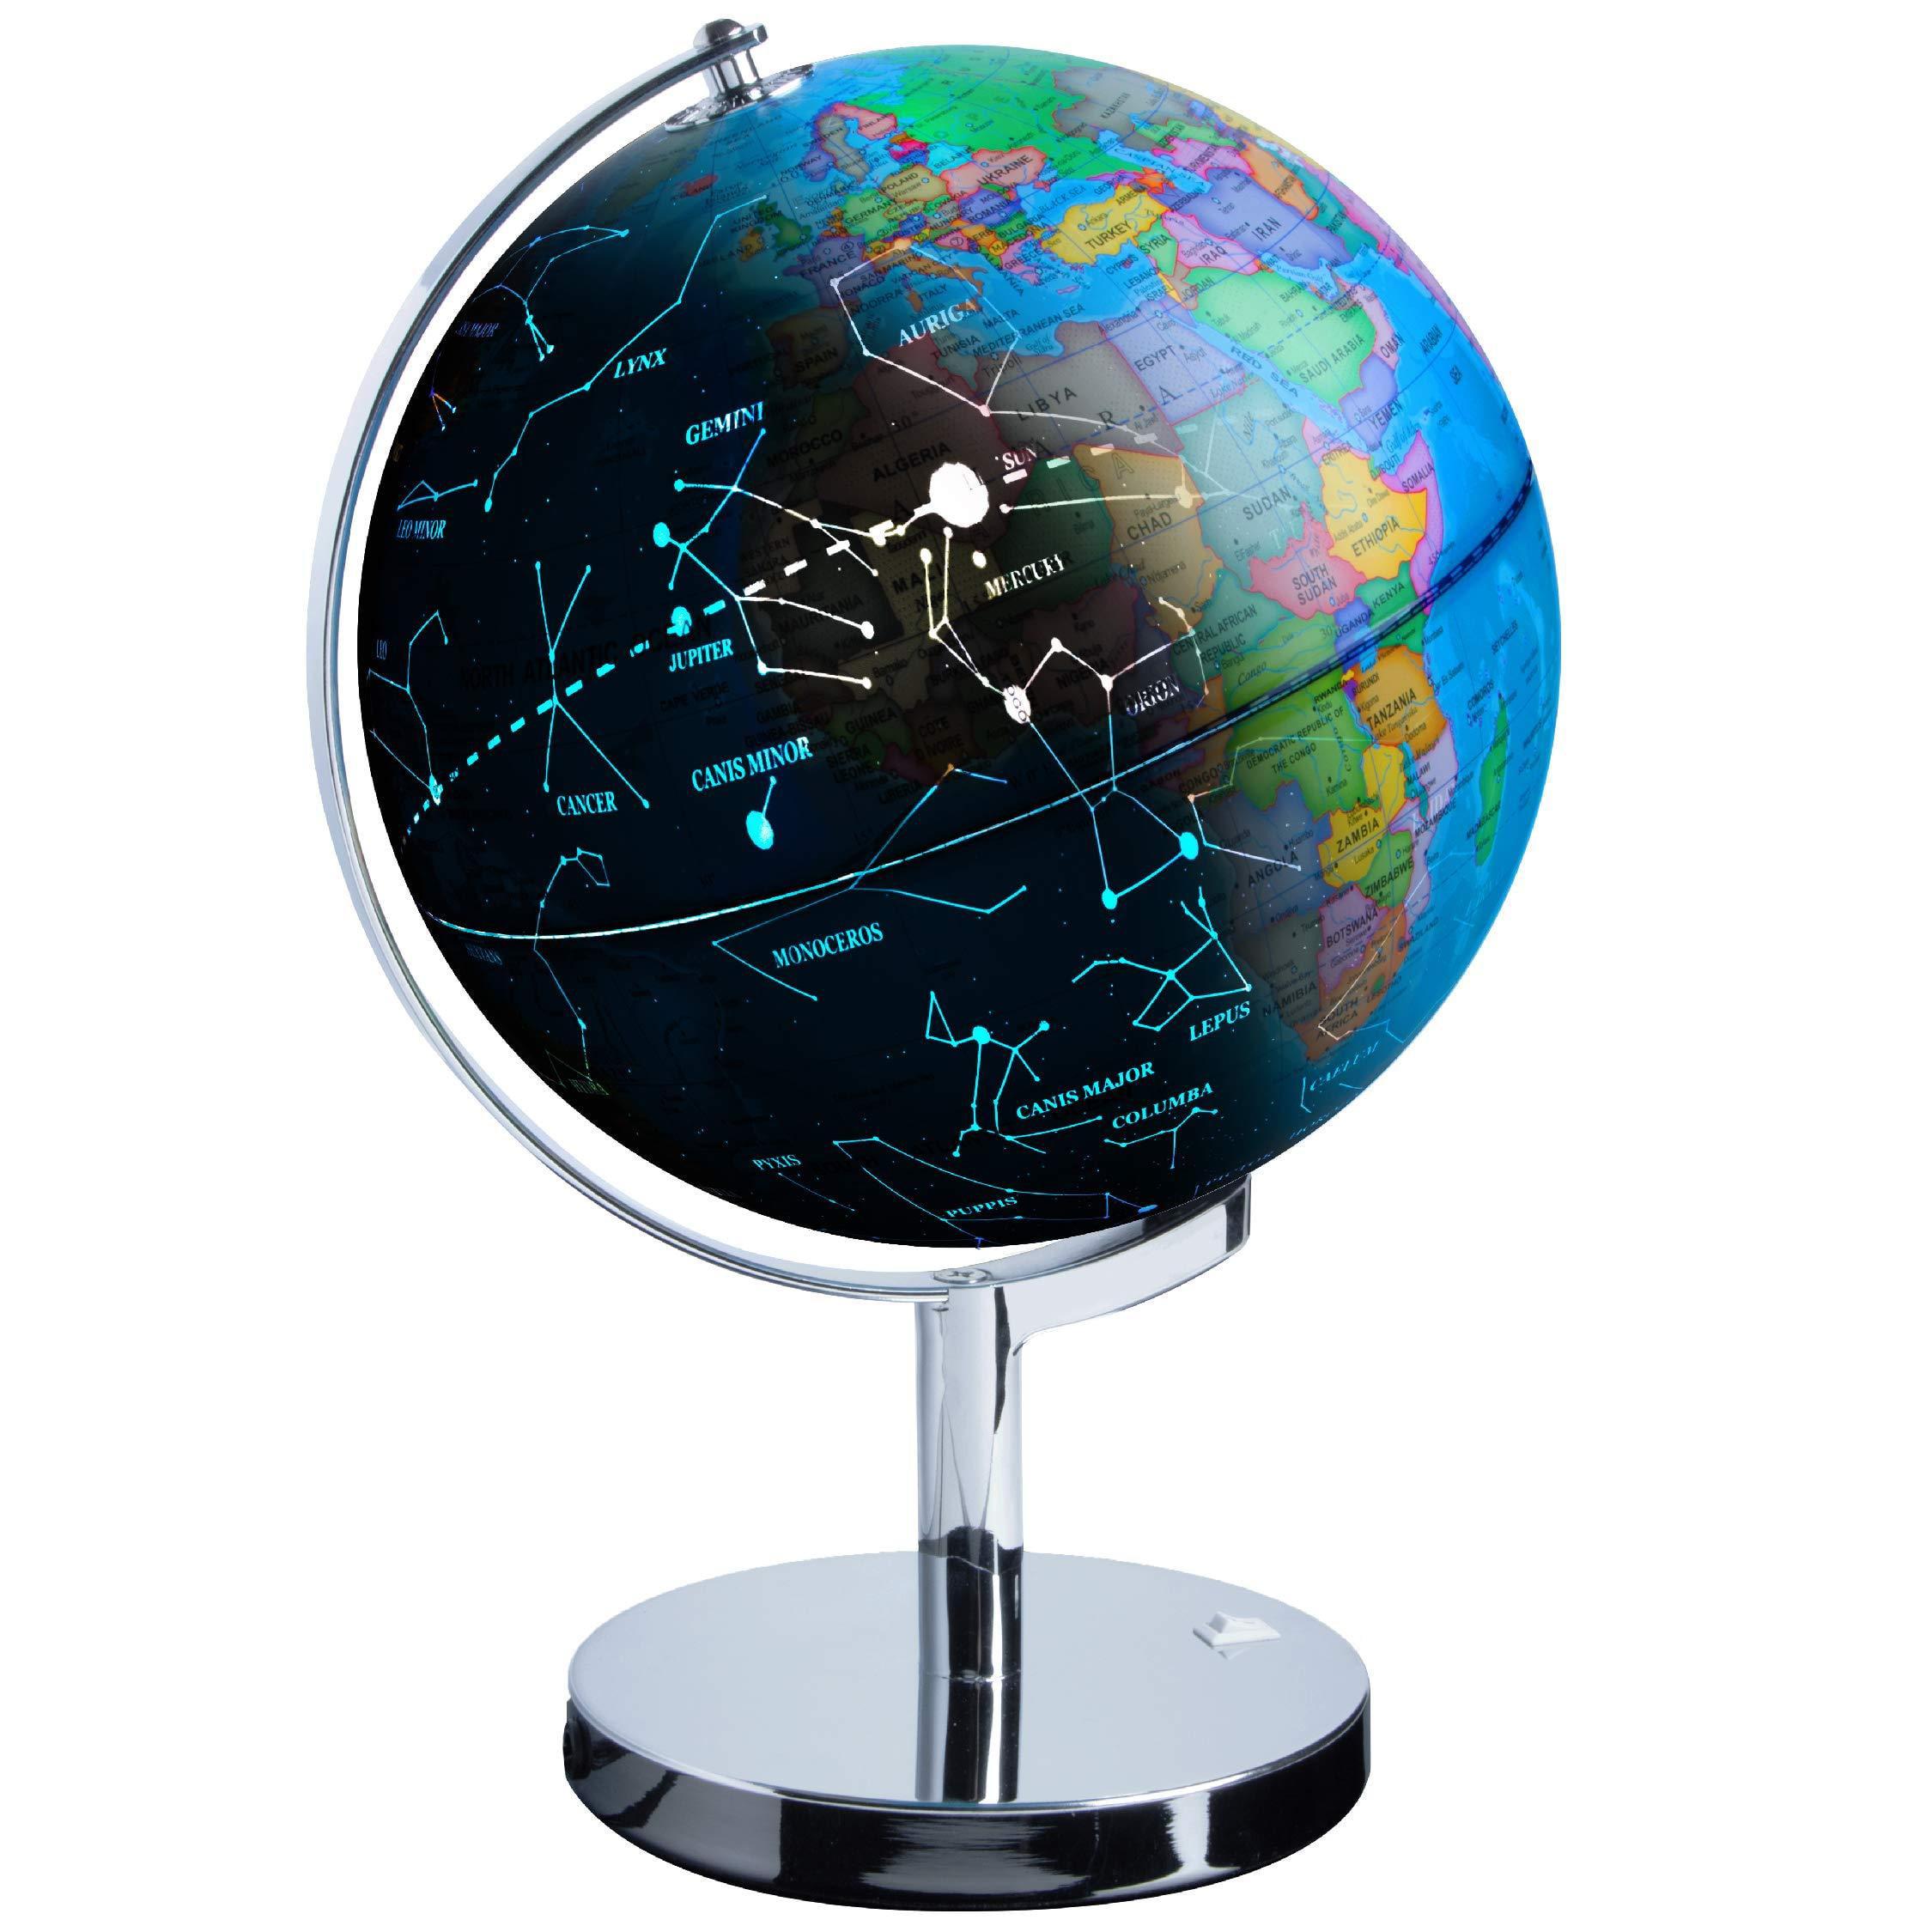 Usa Toyz 3 In 1 Interactive Constellation And World Globe For Child Learning Unisex Walmart Com Walmart Com